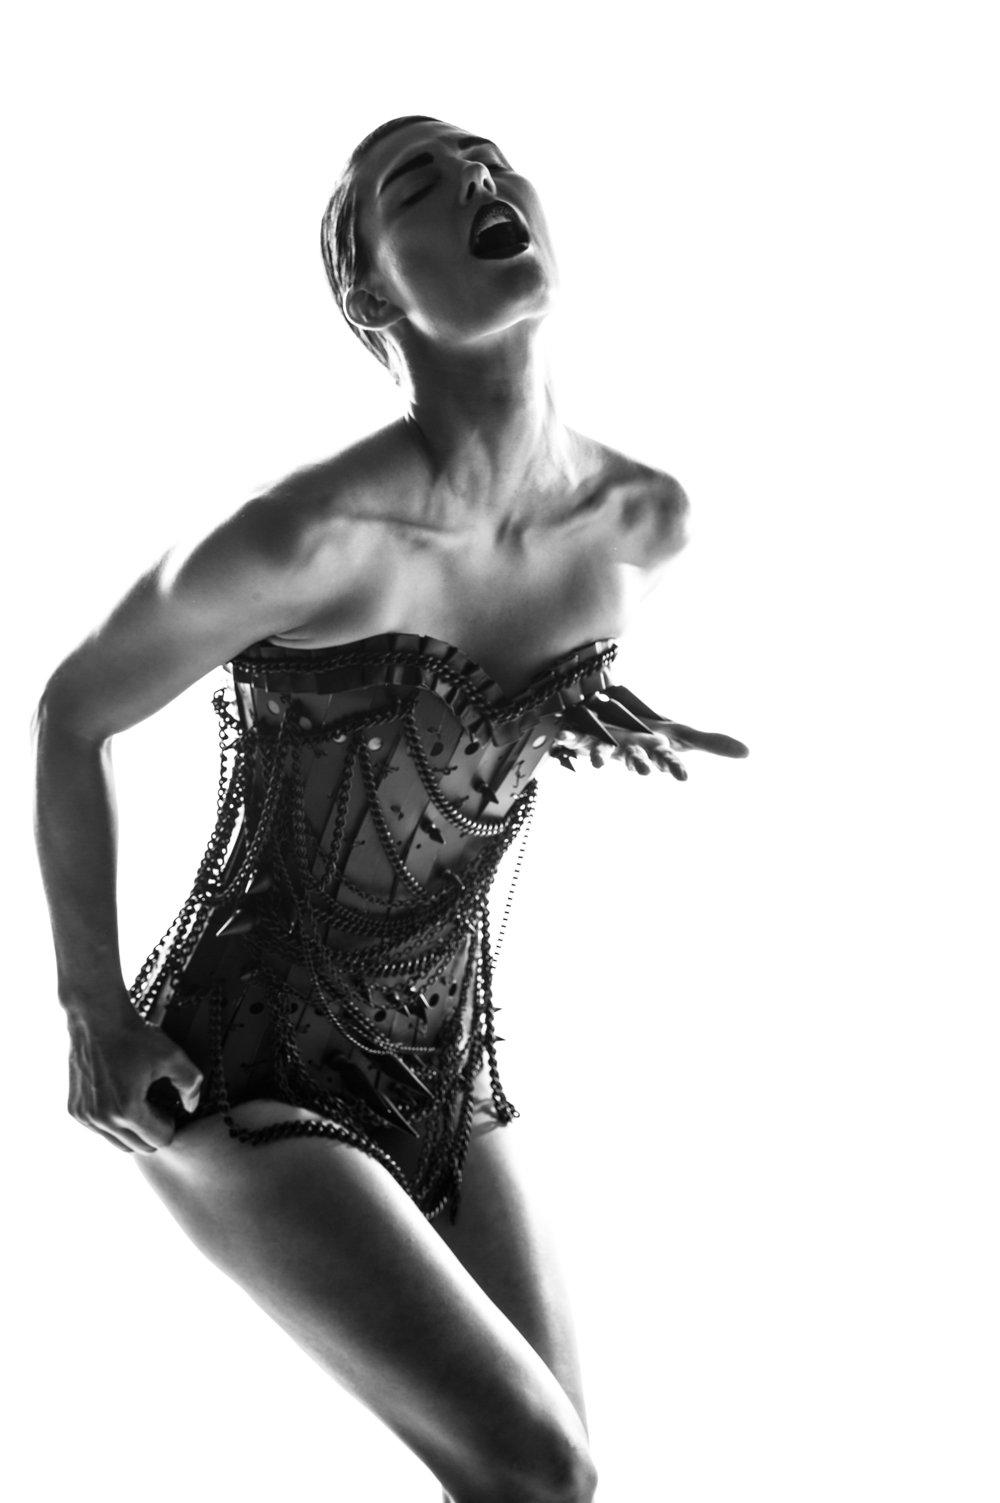 Image of Kara Gibson - A.H. Studio L.A. 2012